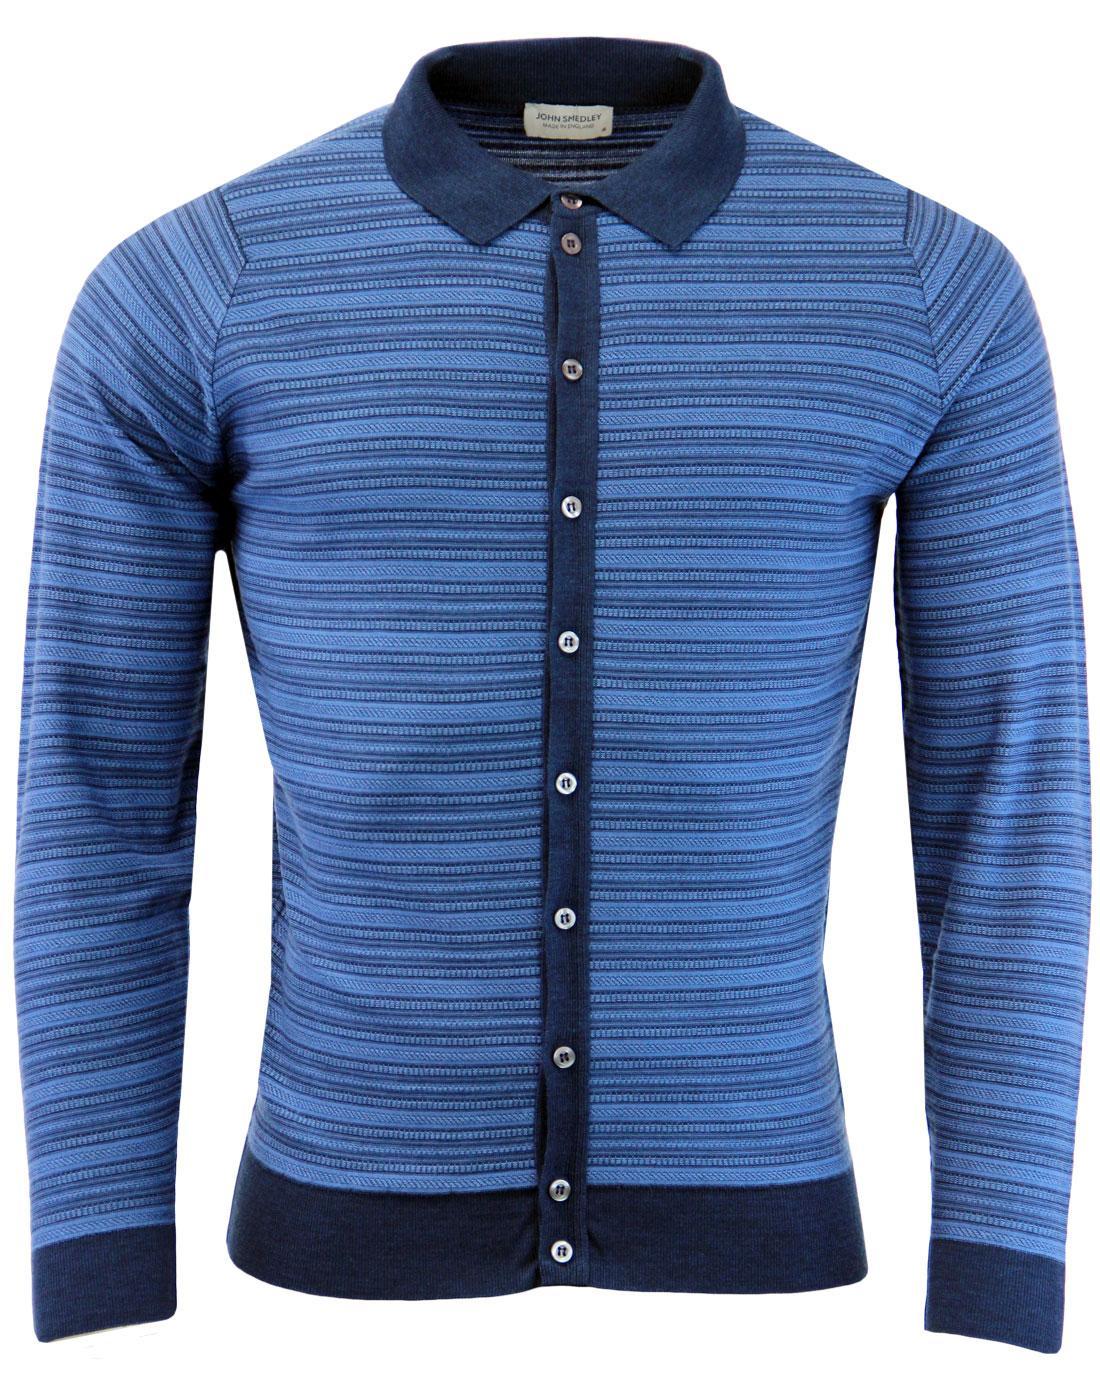 Hemlock JOHN SMEDLEY Mod Jacquard Polo Cardigan